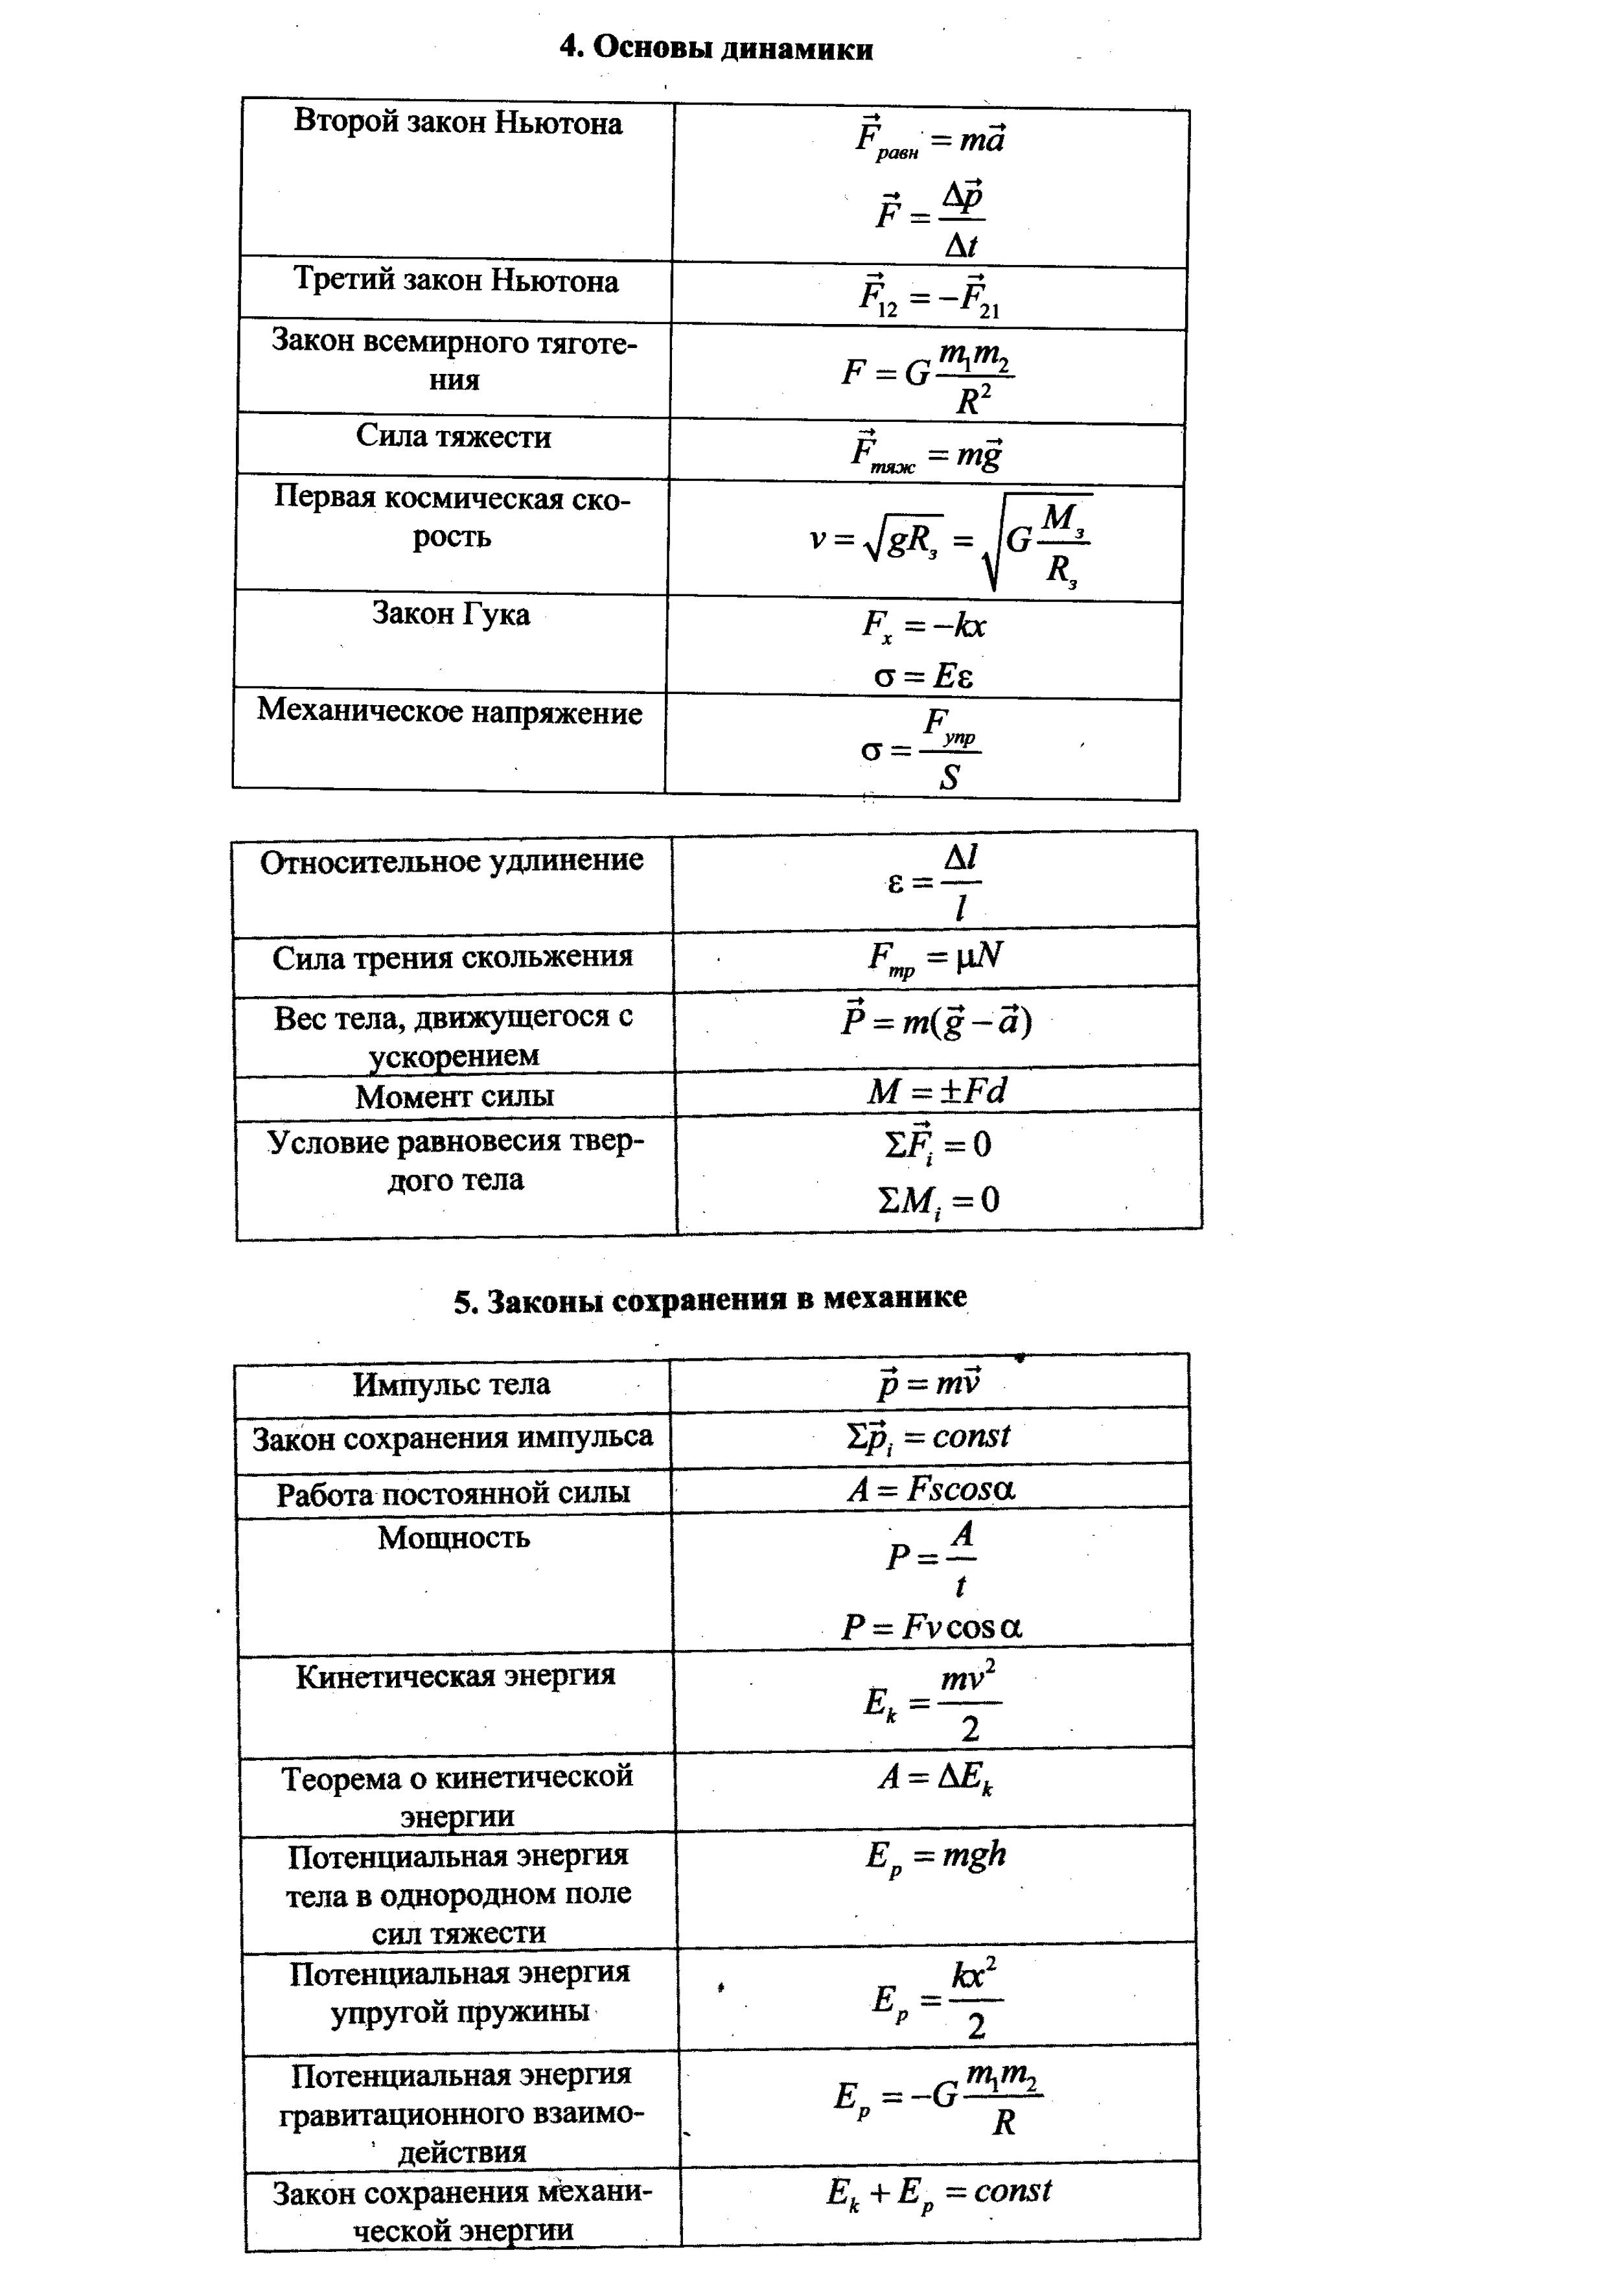 термобелья Различают динамика физика 9 класс инете про